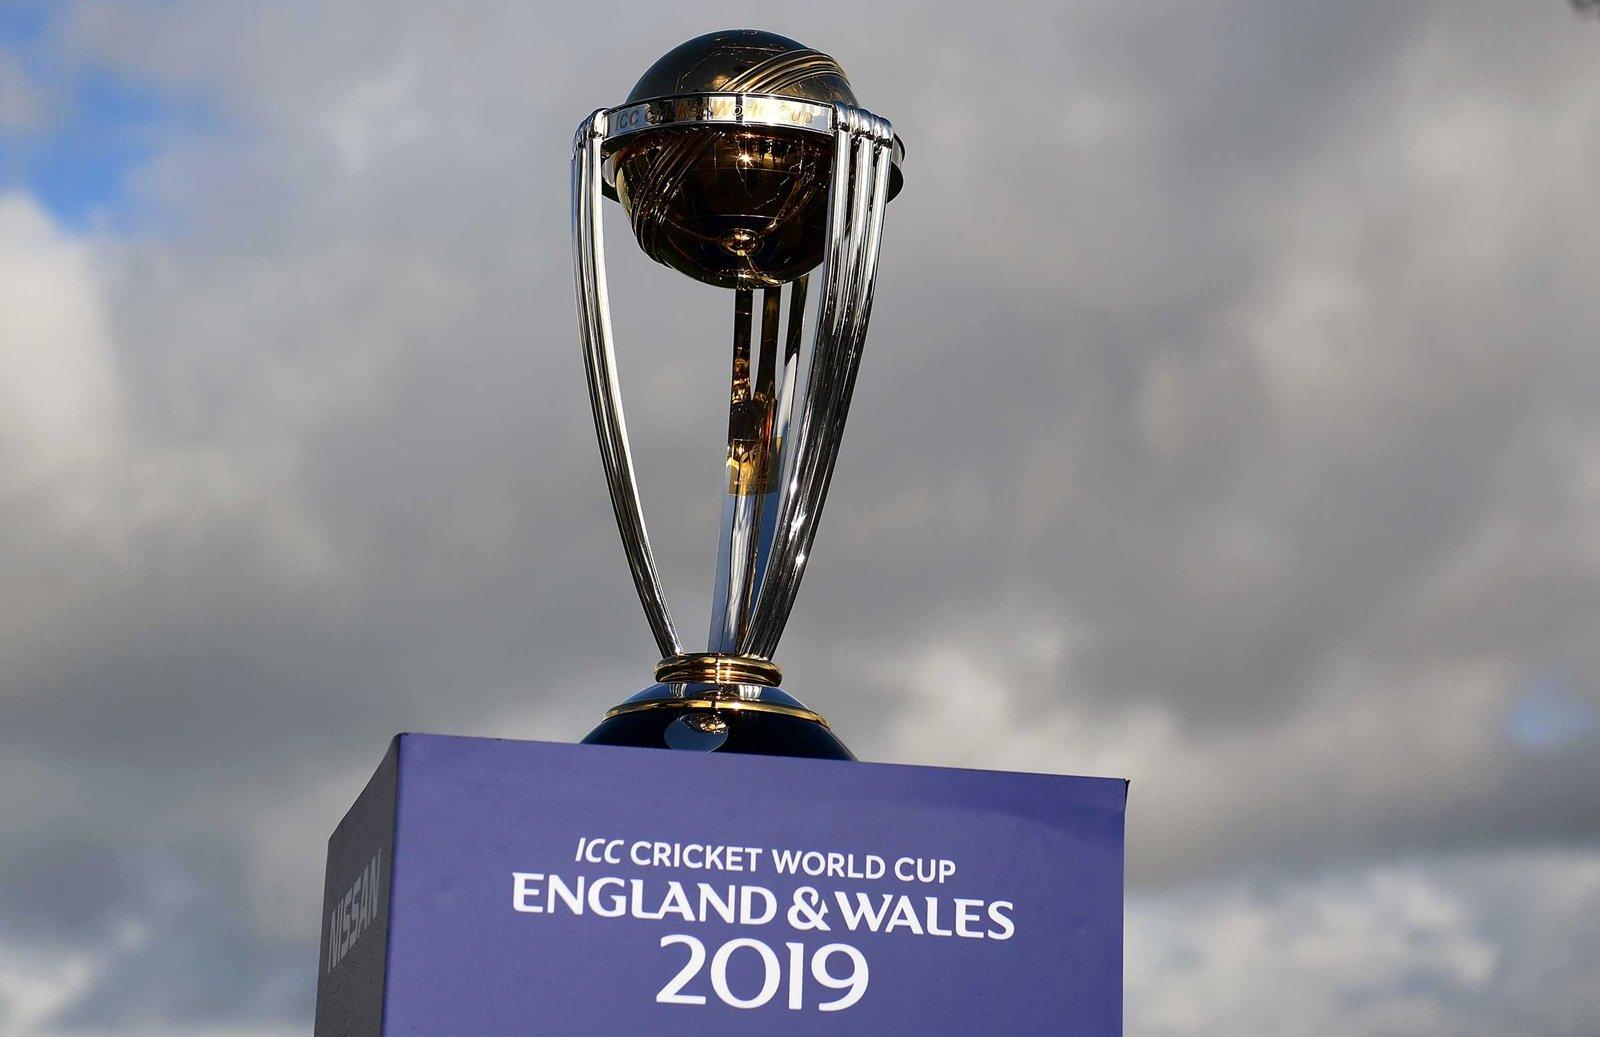 ICC World Cup 2019 Kreedon cricket world cup prize money